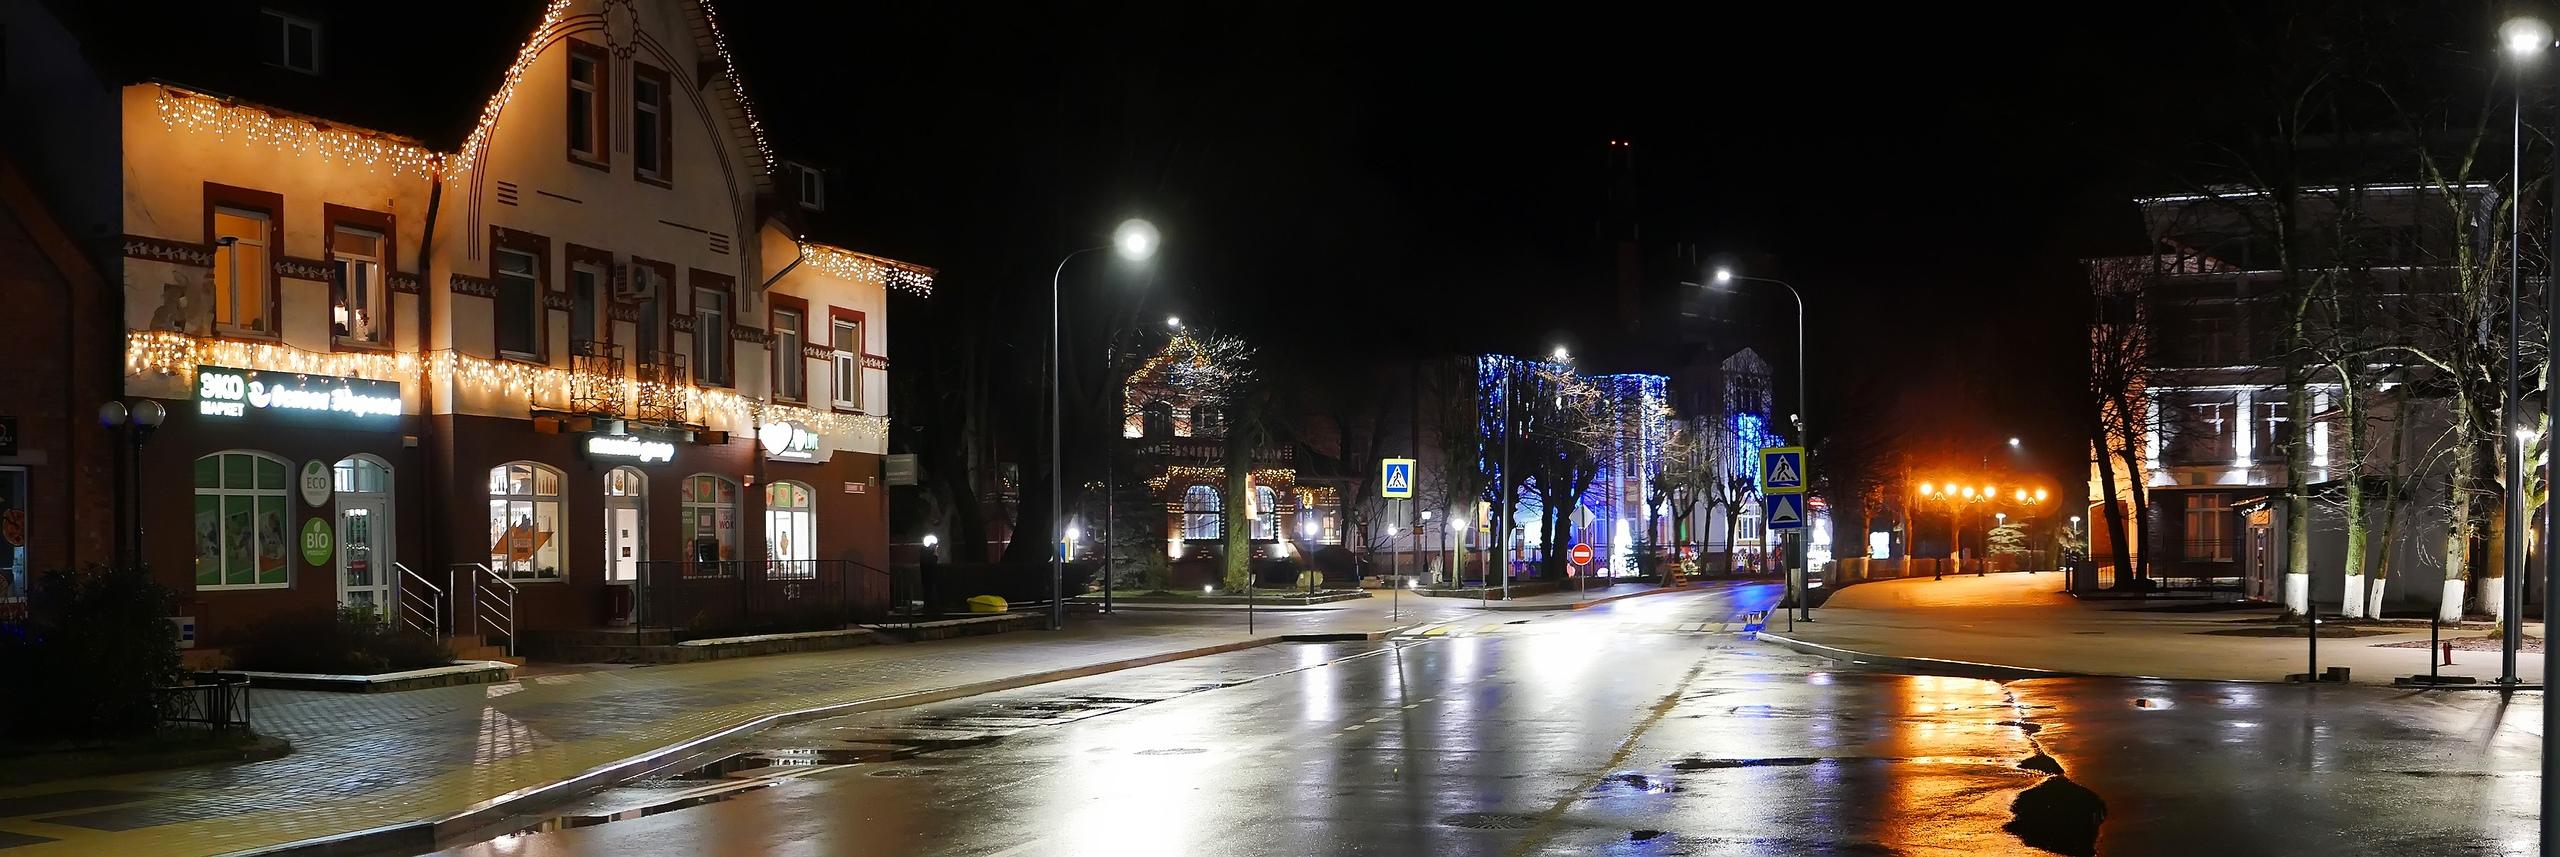 Центр Зеленоградска 23 декабря 2019